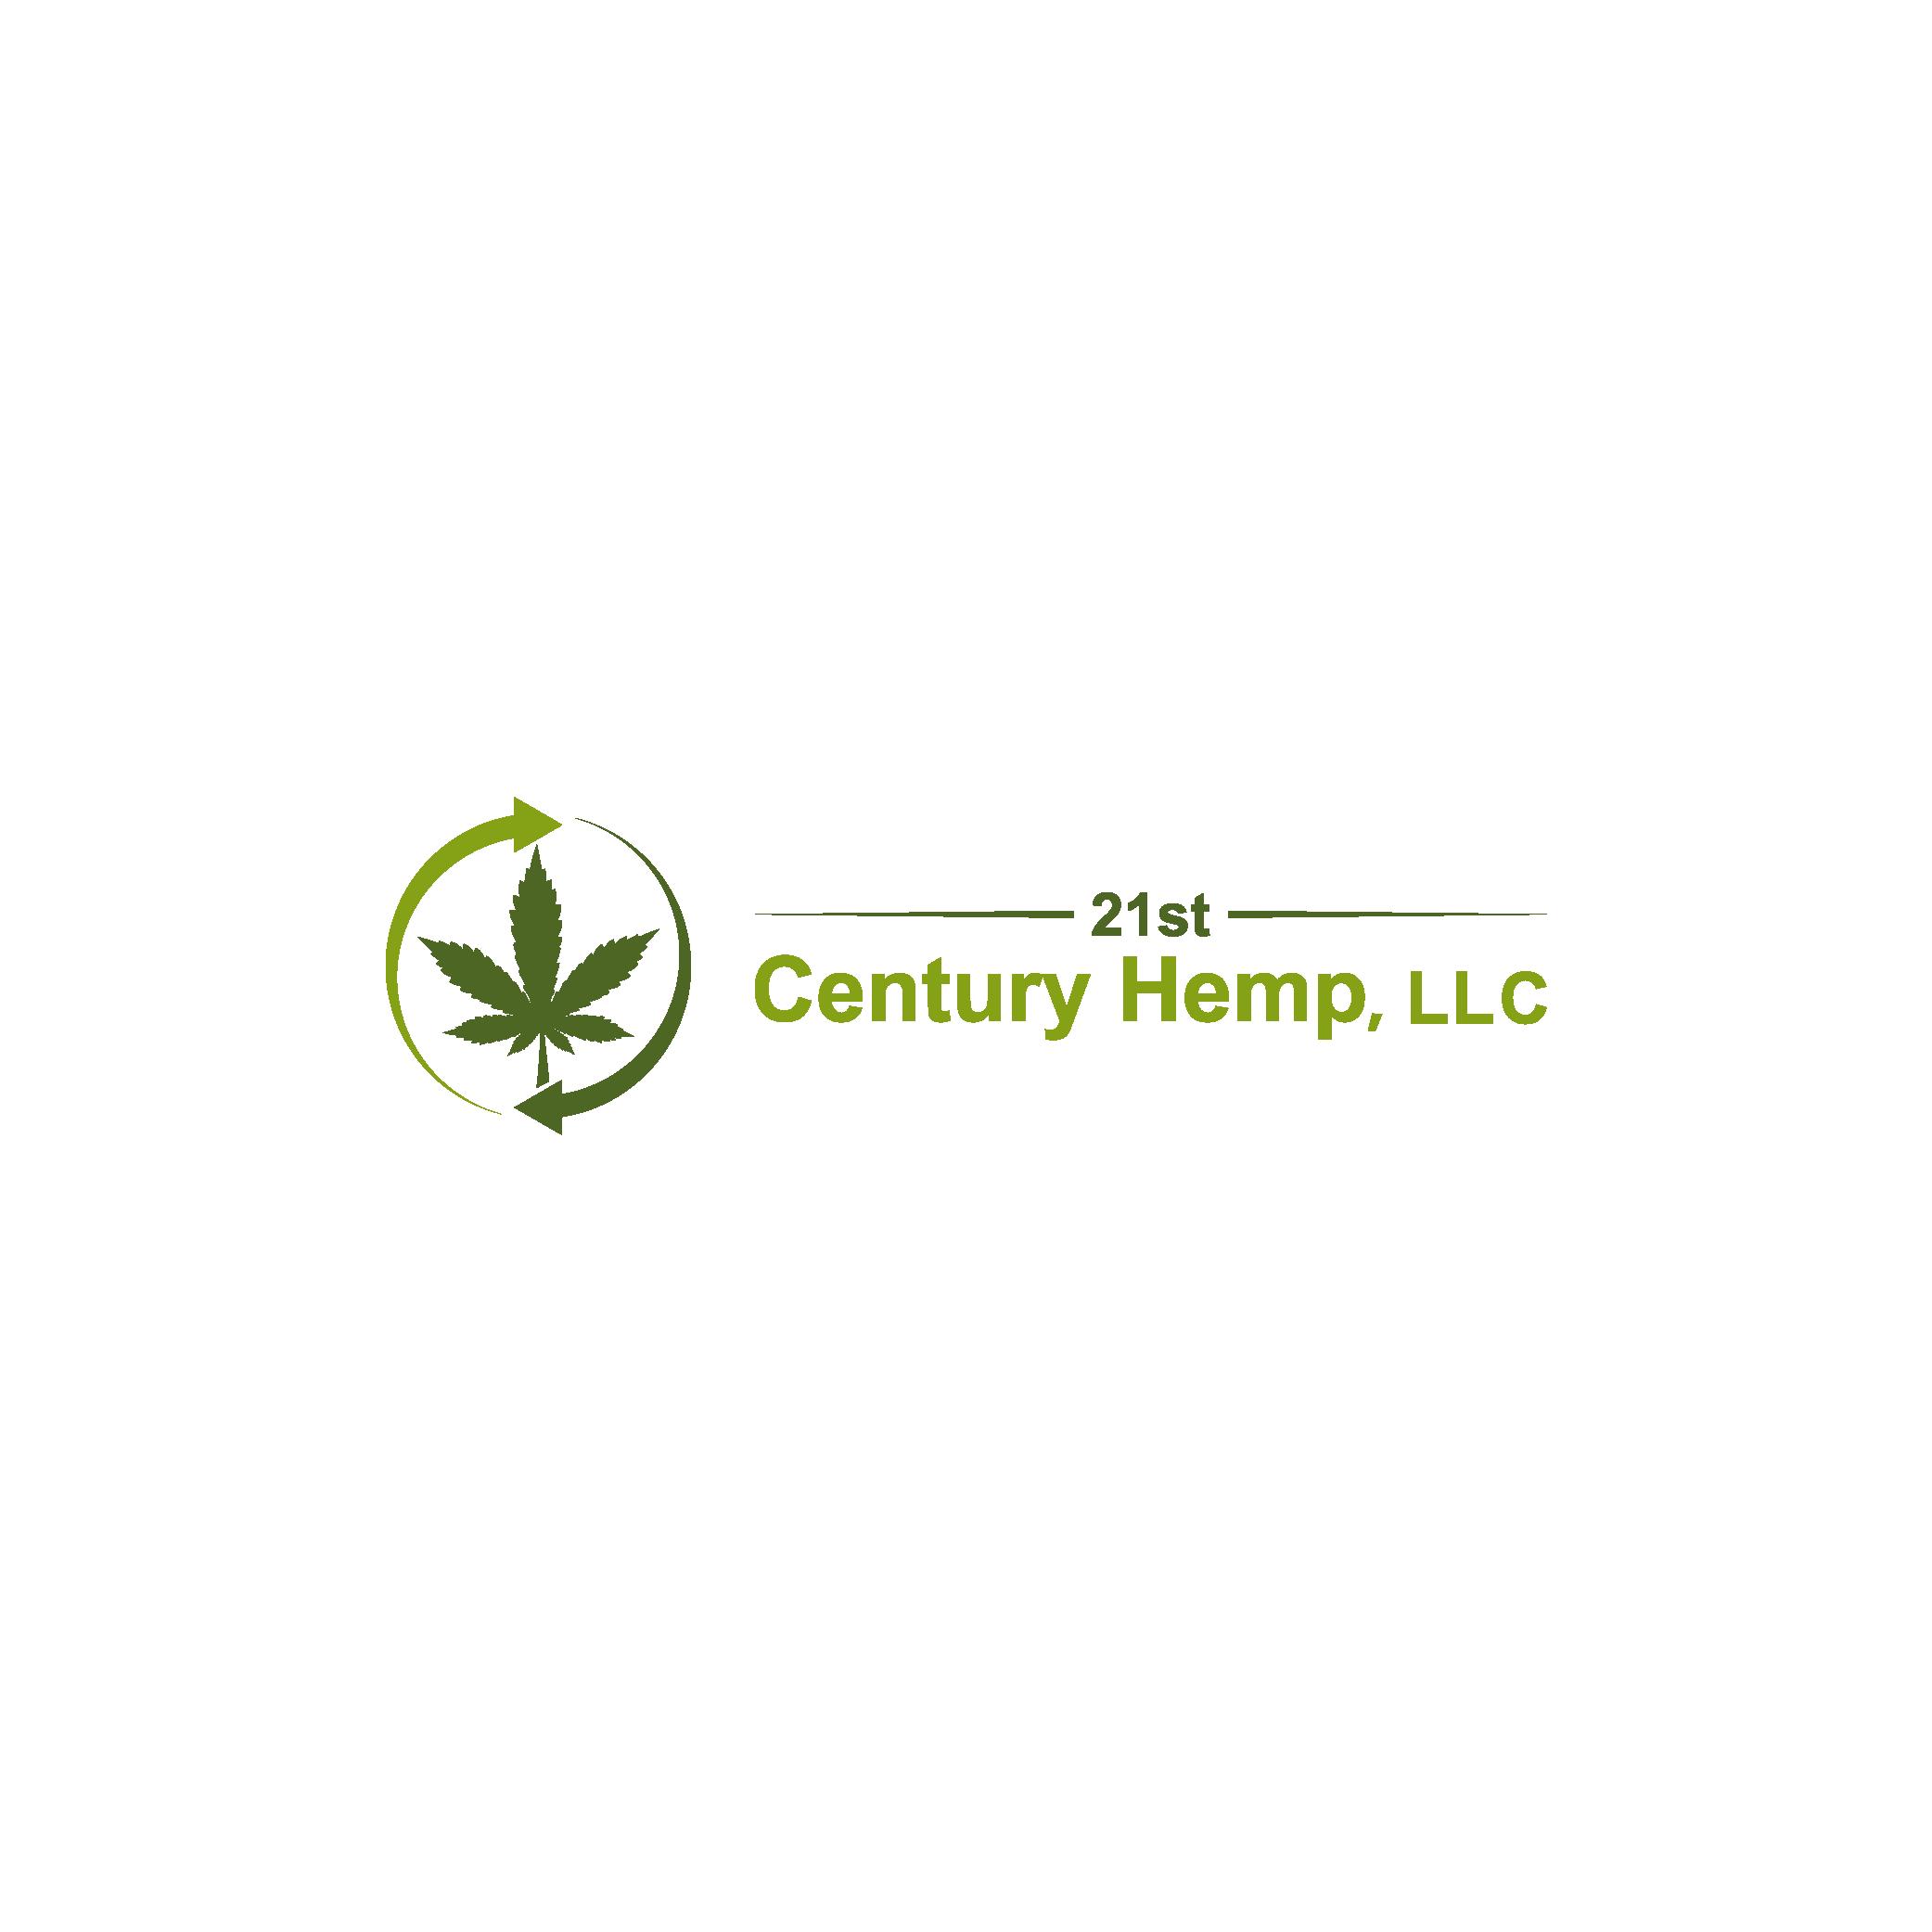 21st Century Hemp needs a captivating logo